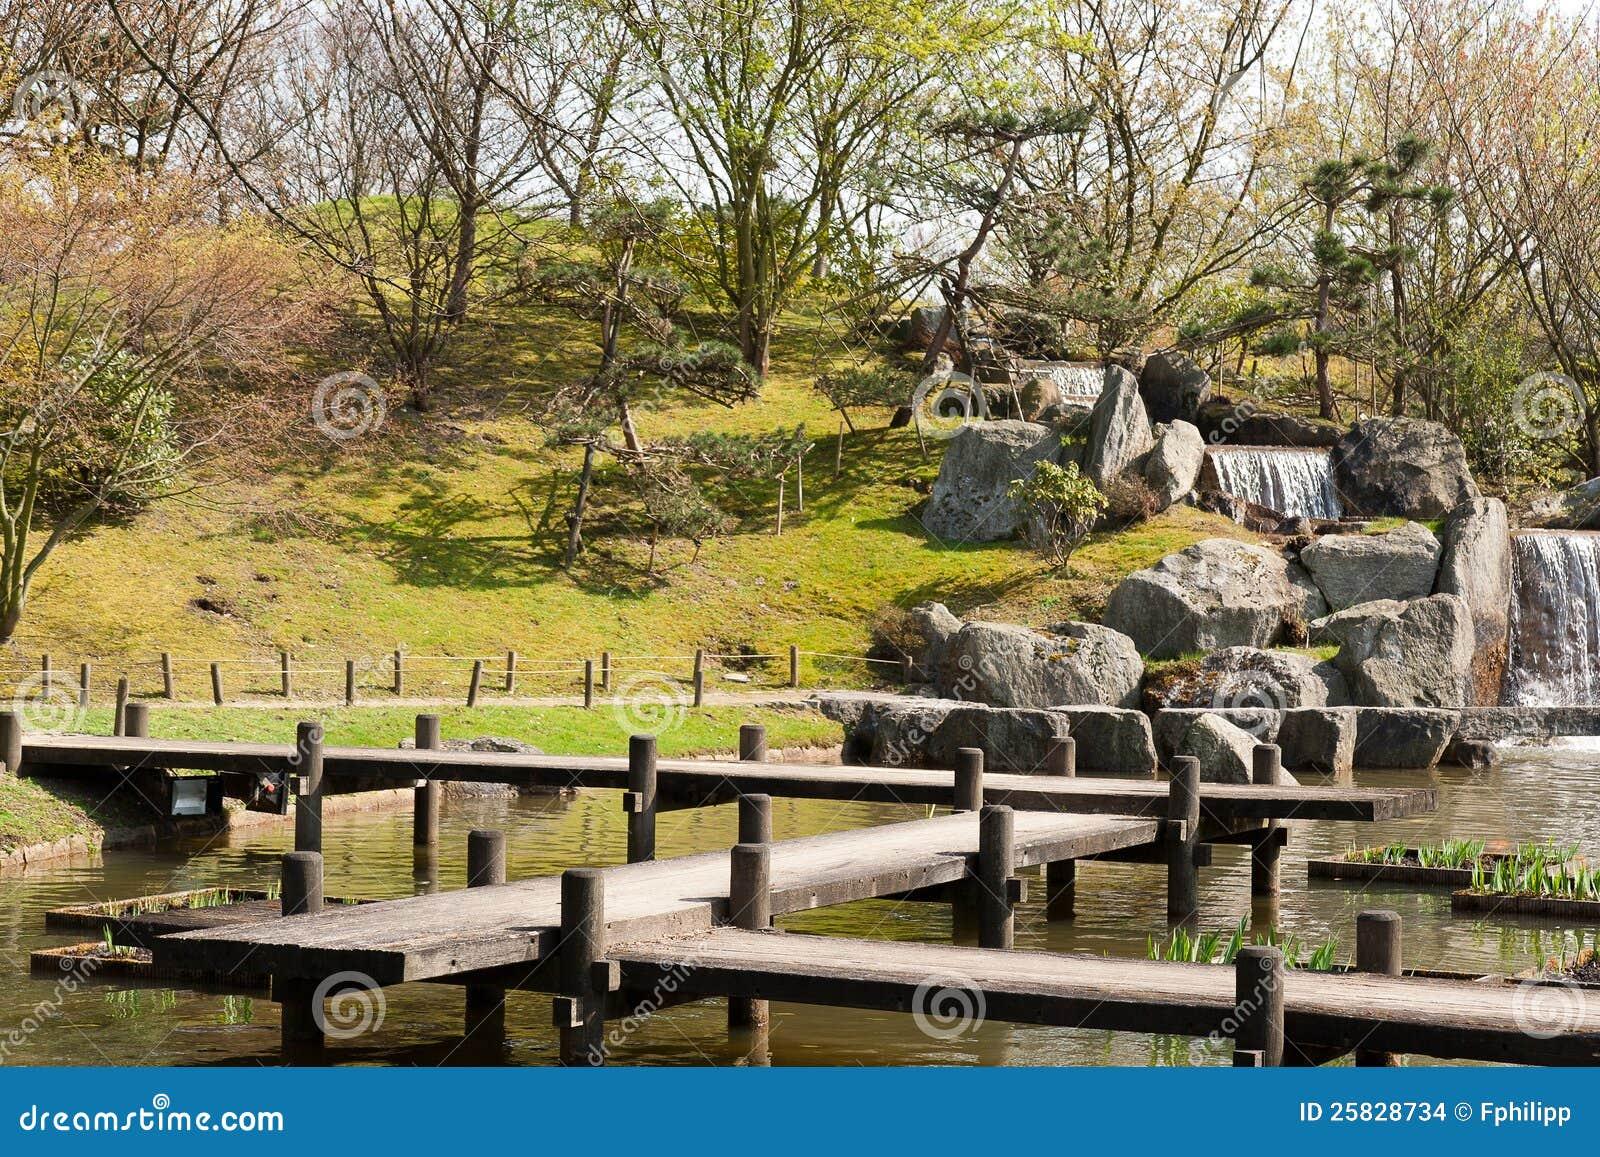 Japanse tuin hasselt belgi stock afbeeldingen beeld 25828734 - Tuin van de tuin ...